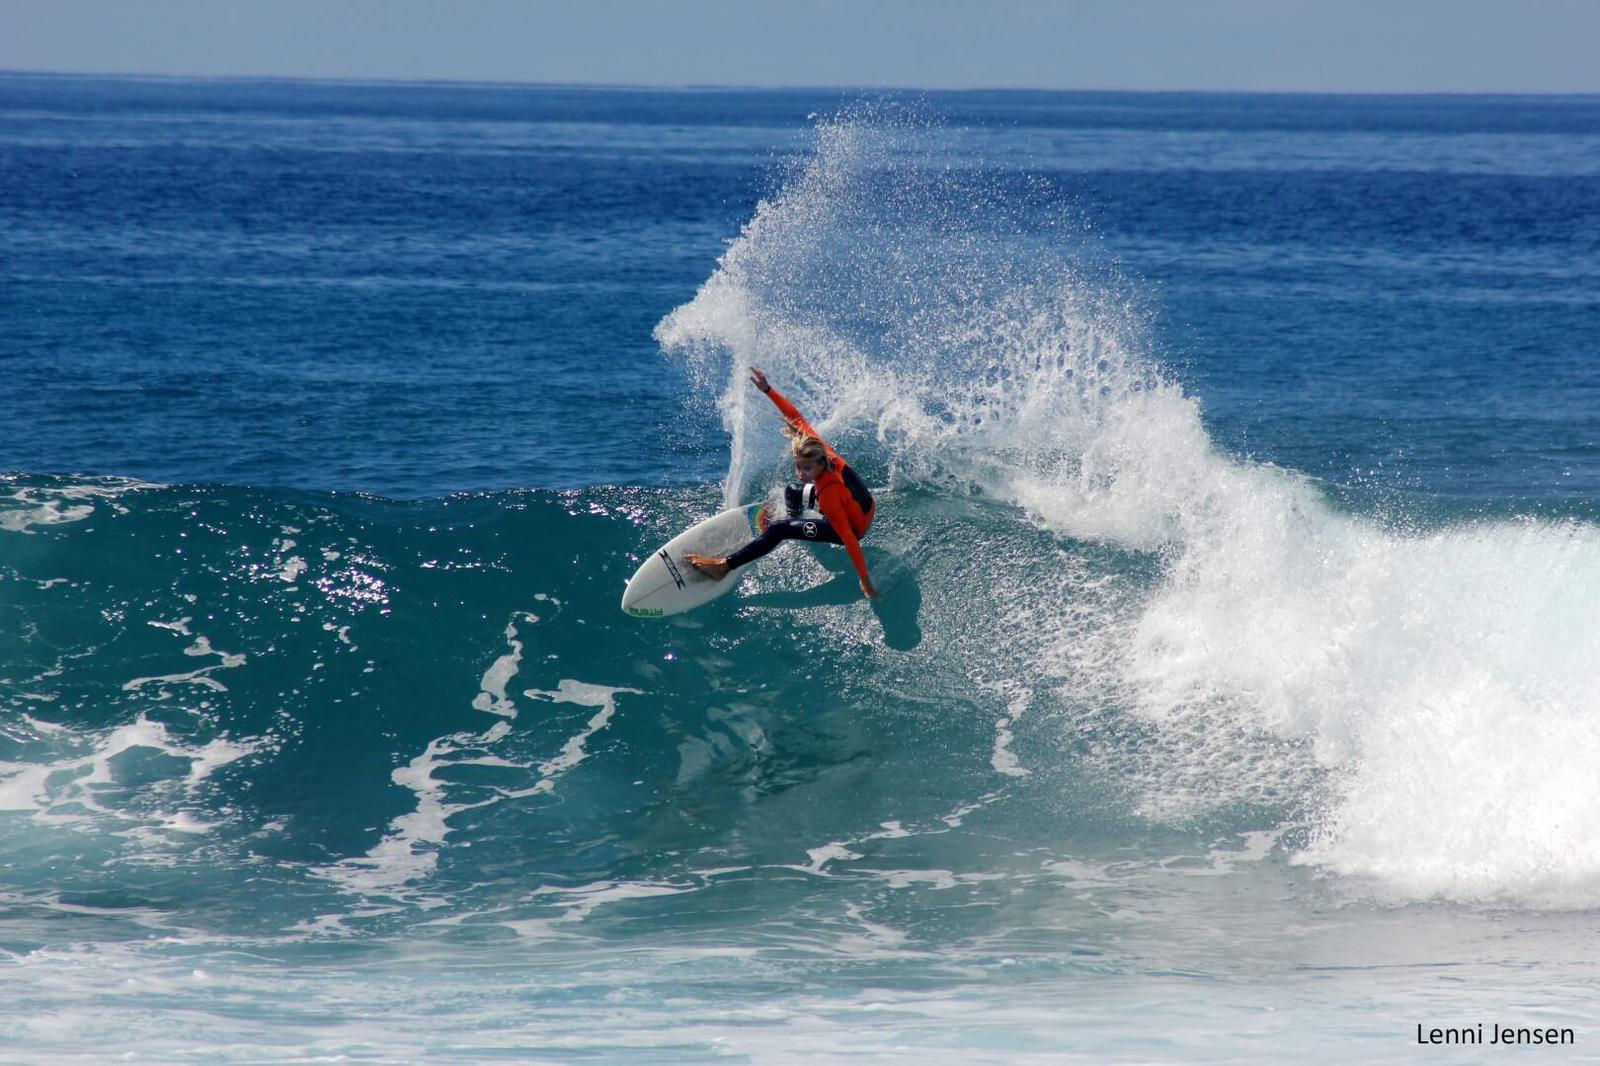 IMG_8708_Lenni Jensen surf en españa